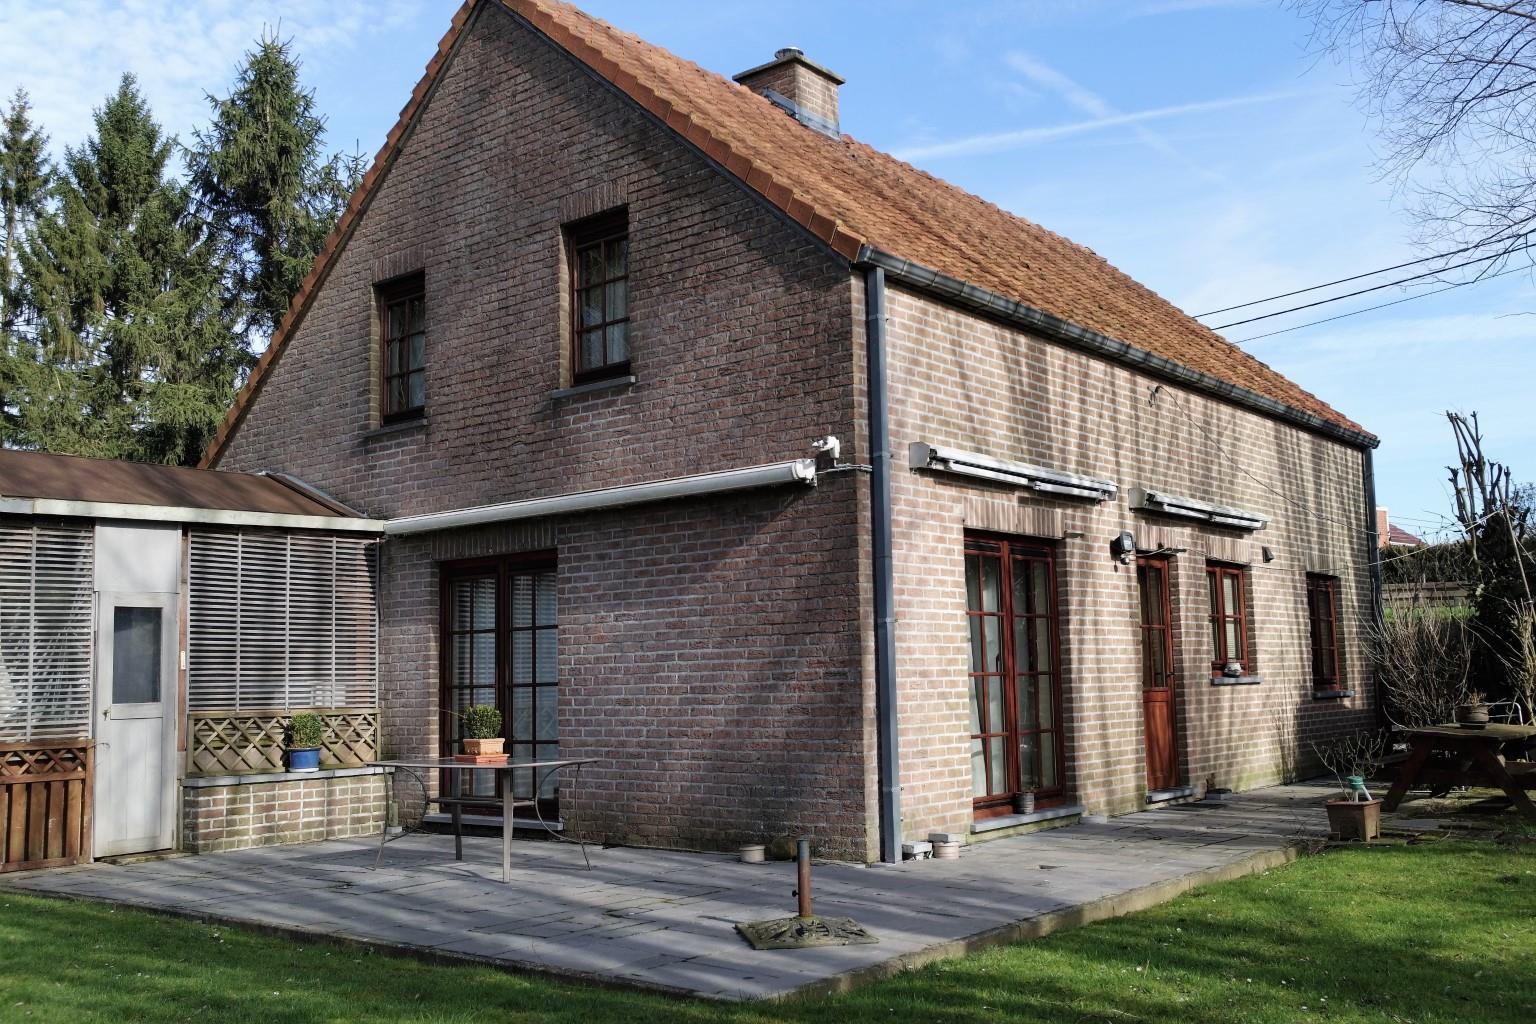 Villa - Braine-le-Comte Petit-Roeulxlez-Braine - #3029346-12